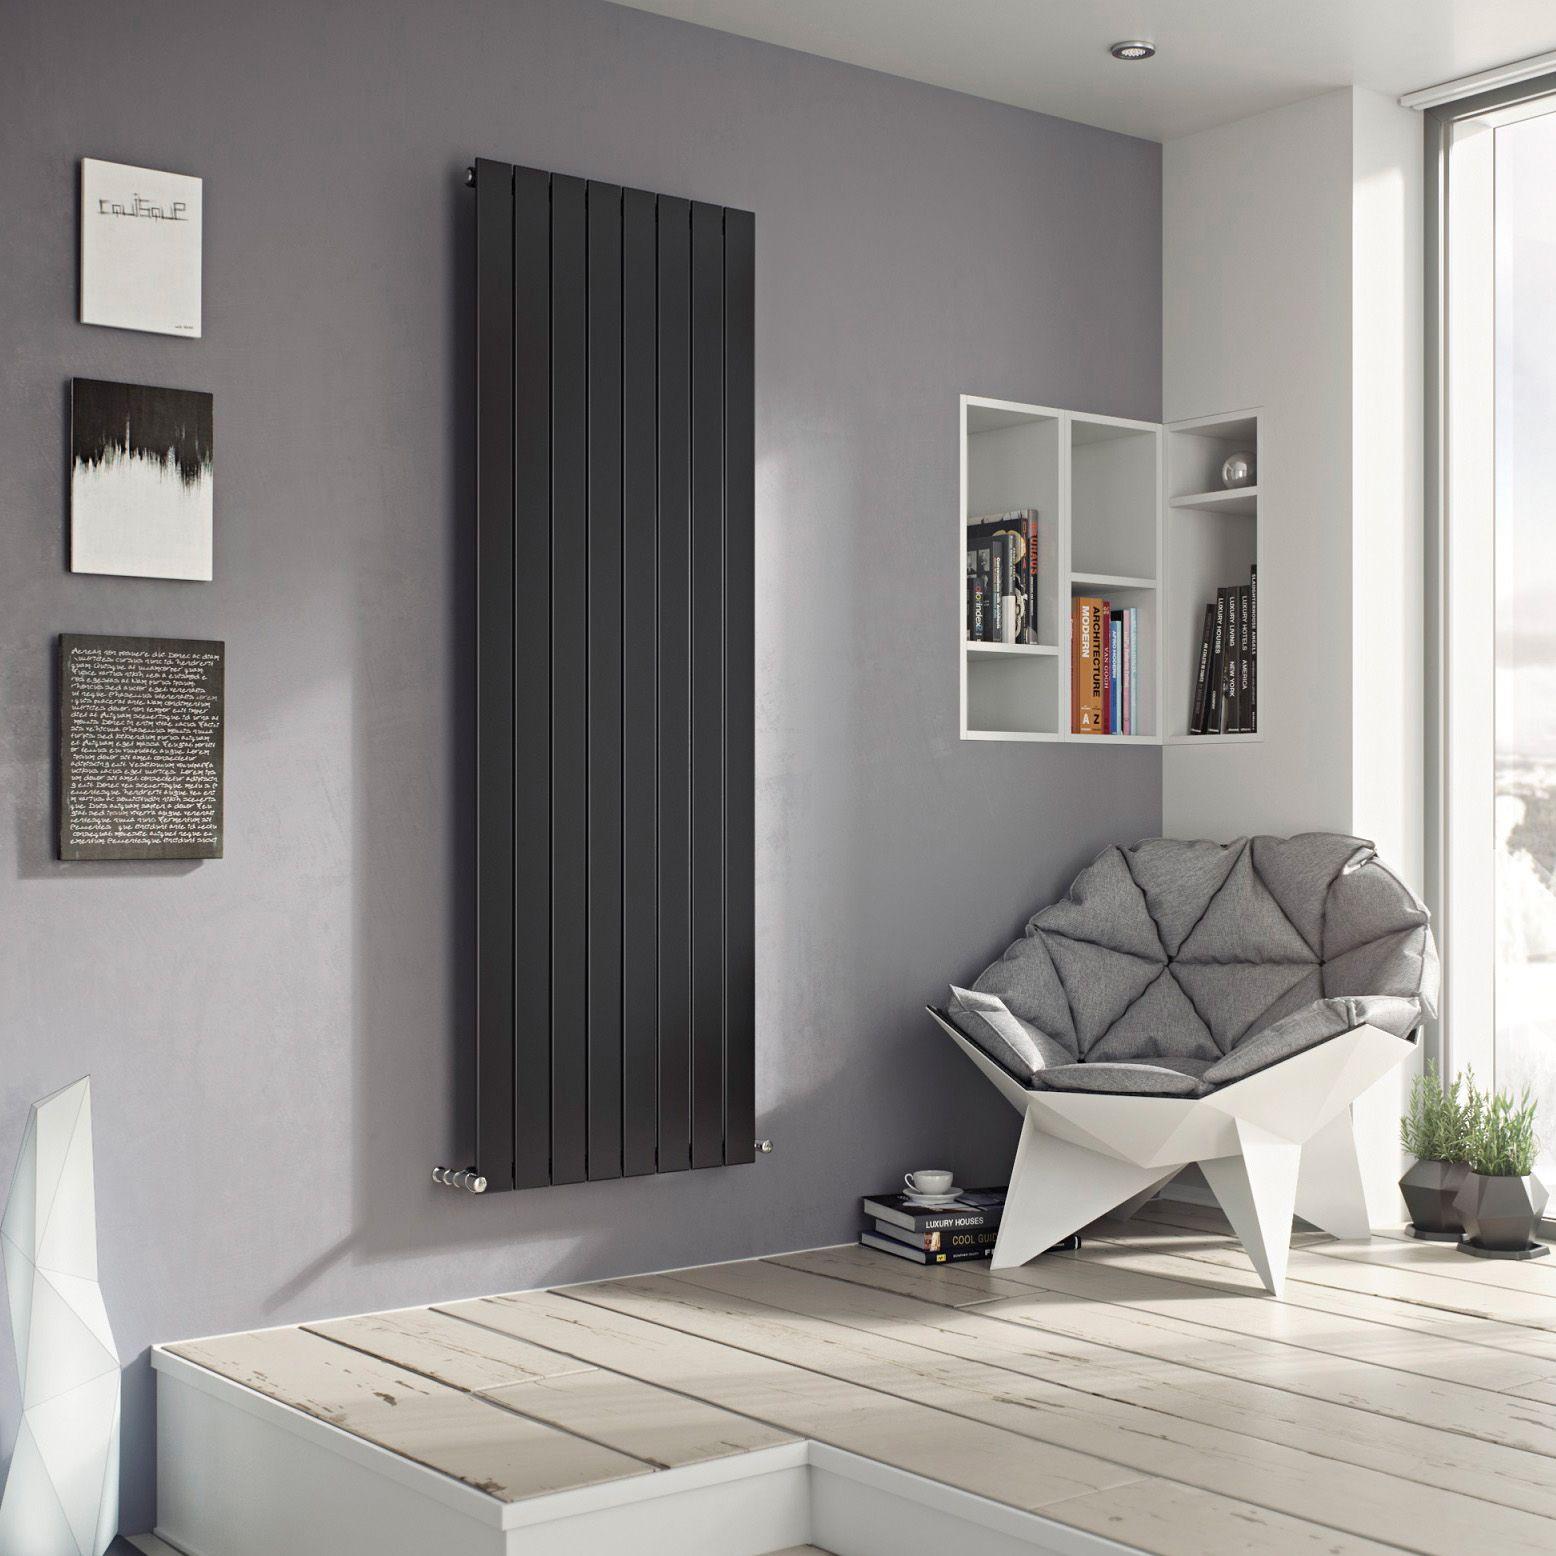 Image result for anthracite radiators